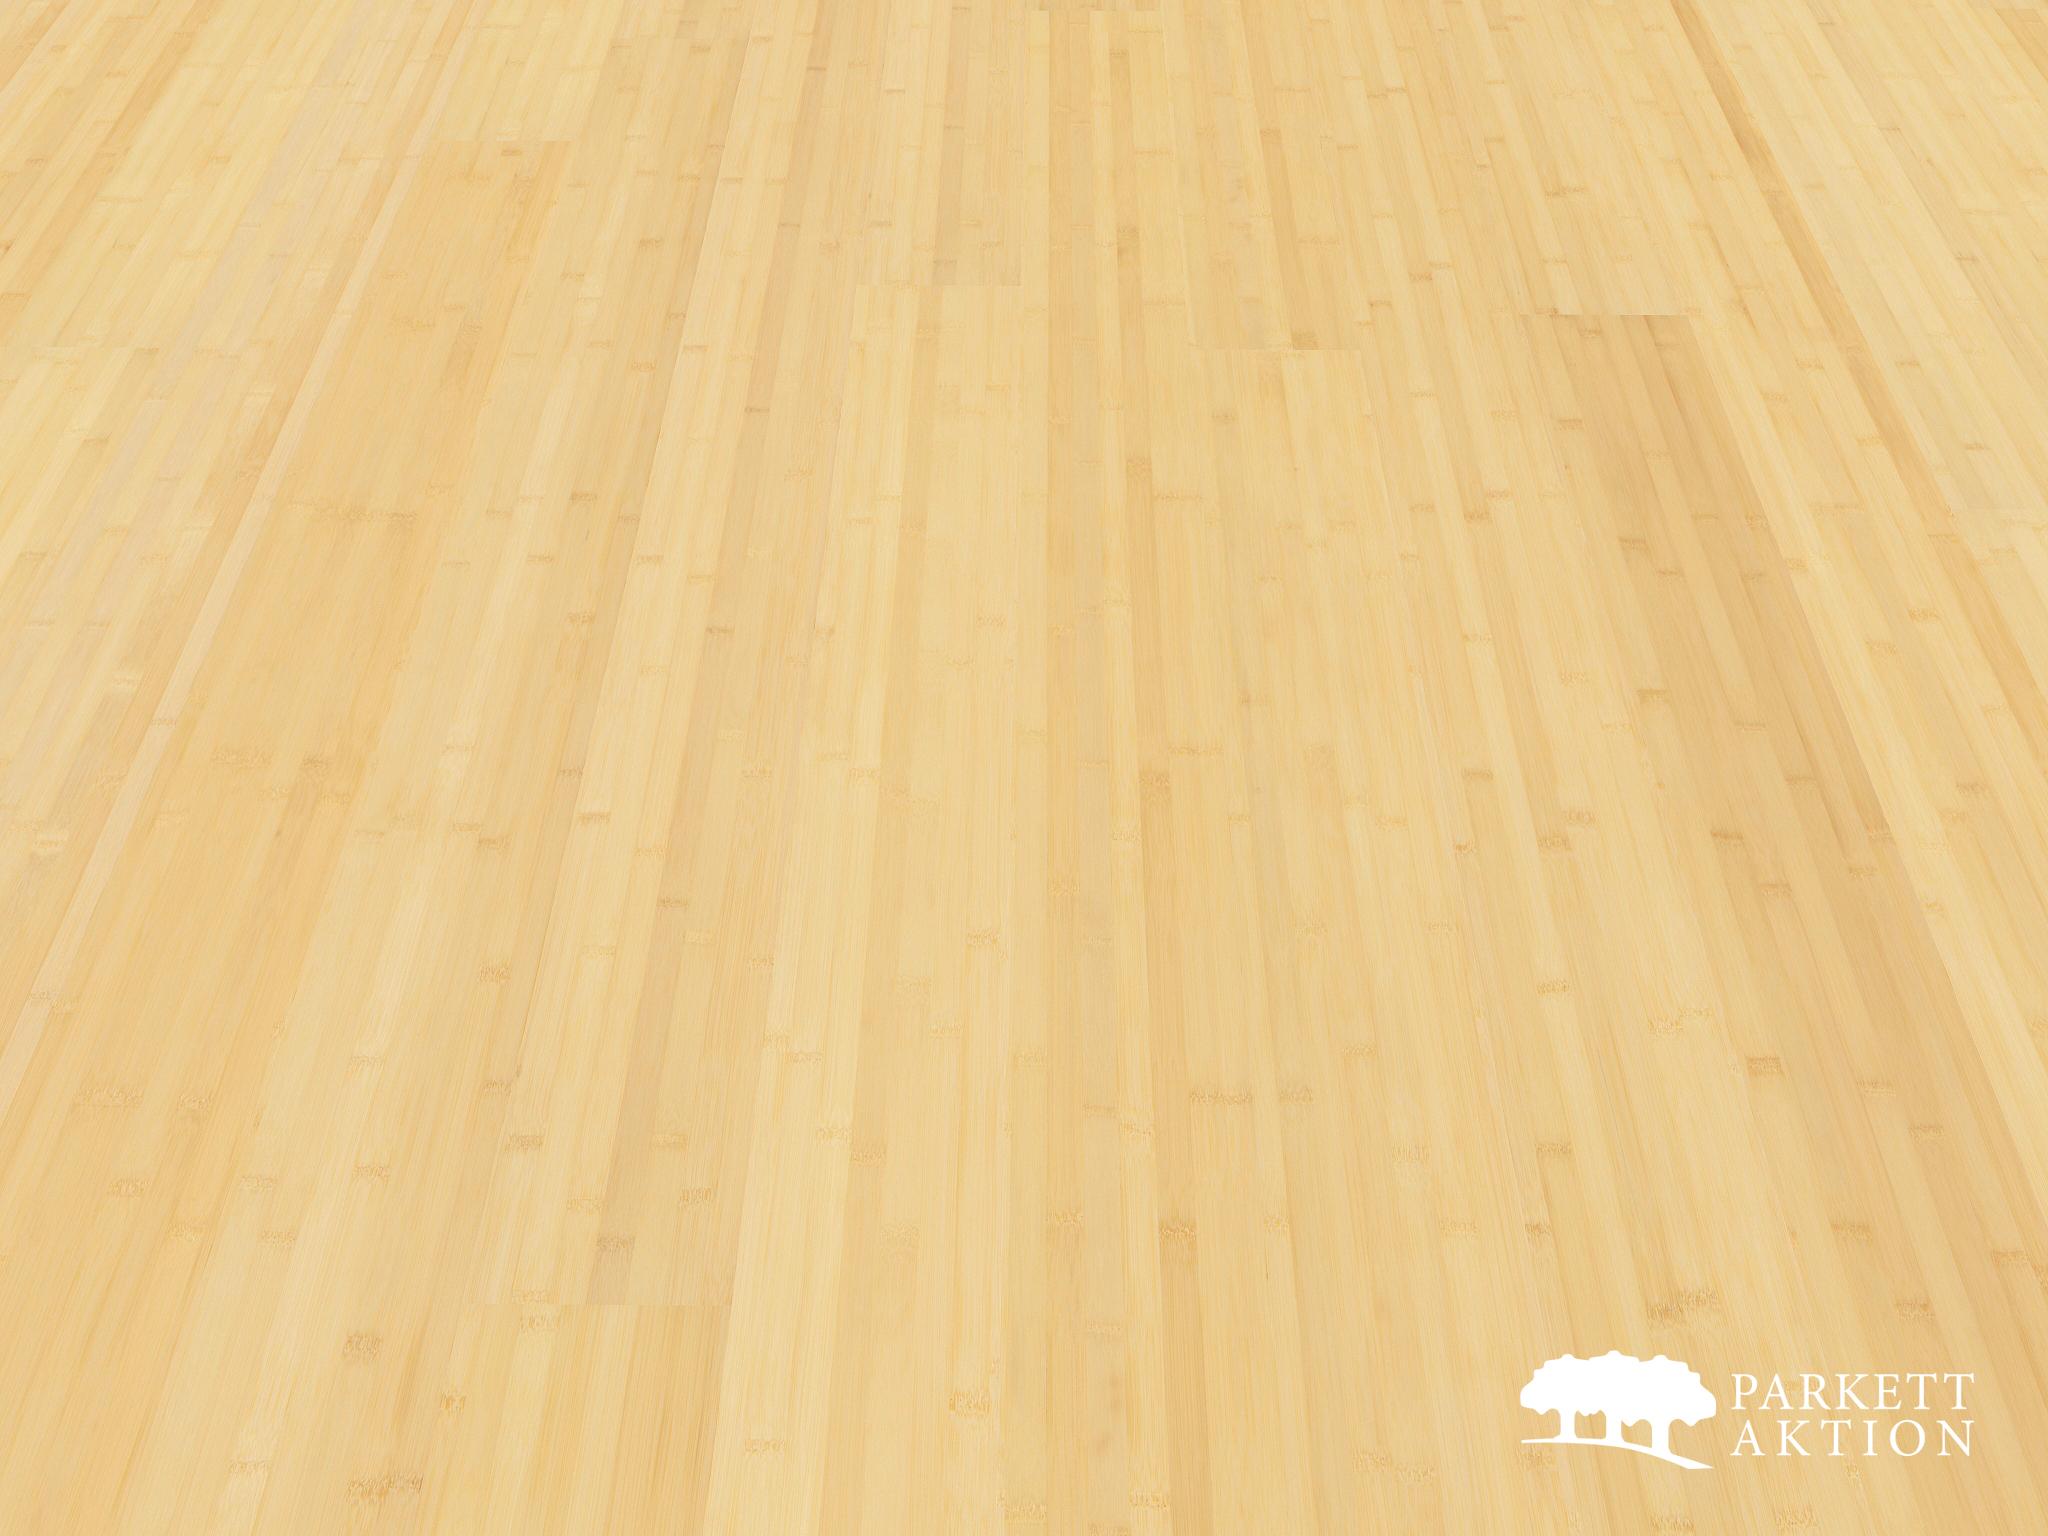 Super Bambusparkett naturhell lackiert - Parkett Aktion - DE - parkett JQ71